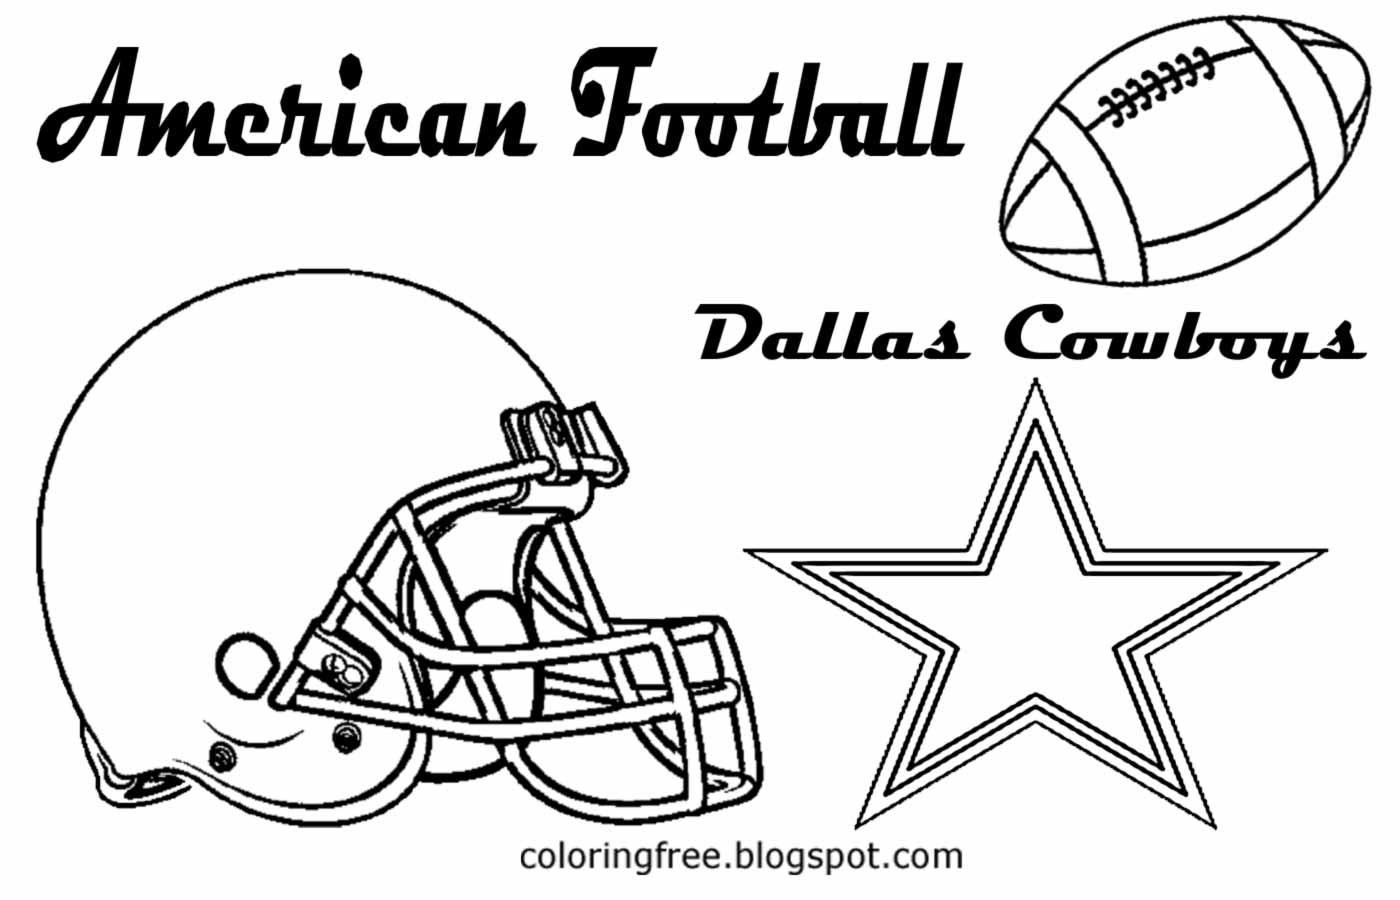 Dallas Cowboys Coloring Pages  Dallas Cowboys Free Colouring Pages